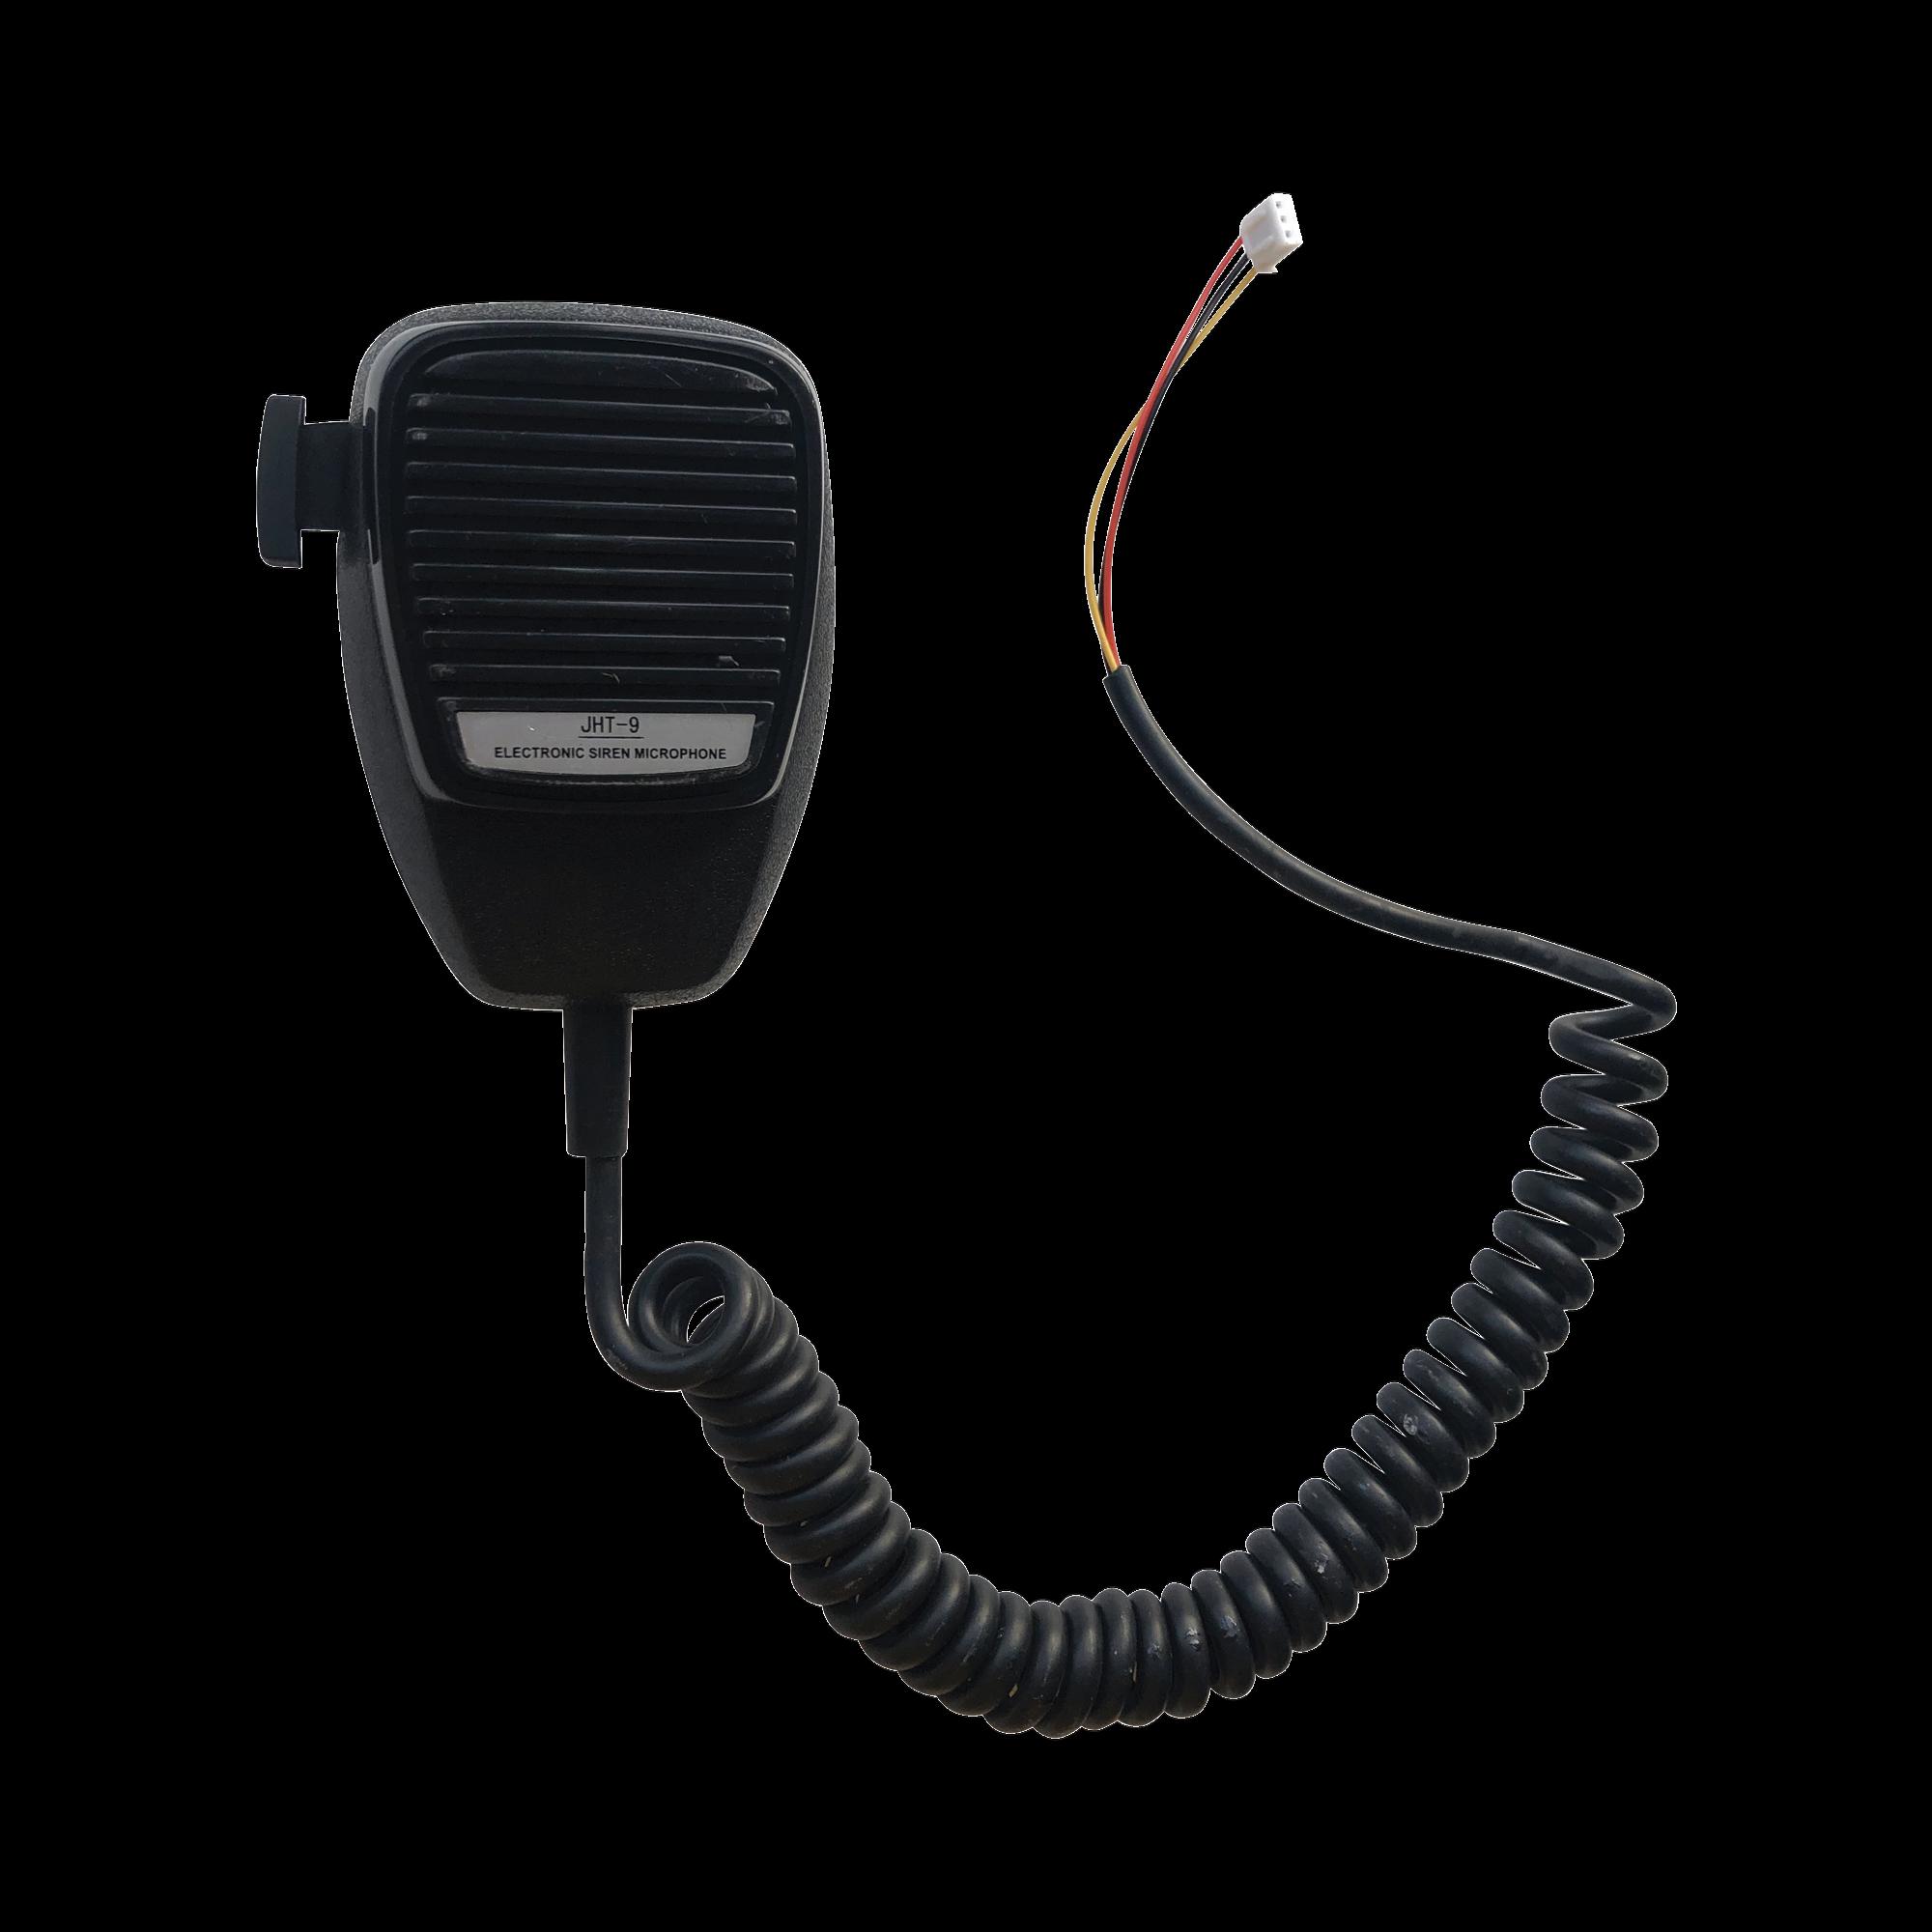 Micrófono de reemplazo para sirena XELS